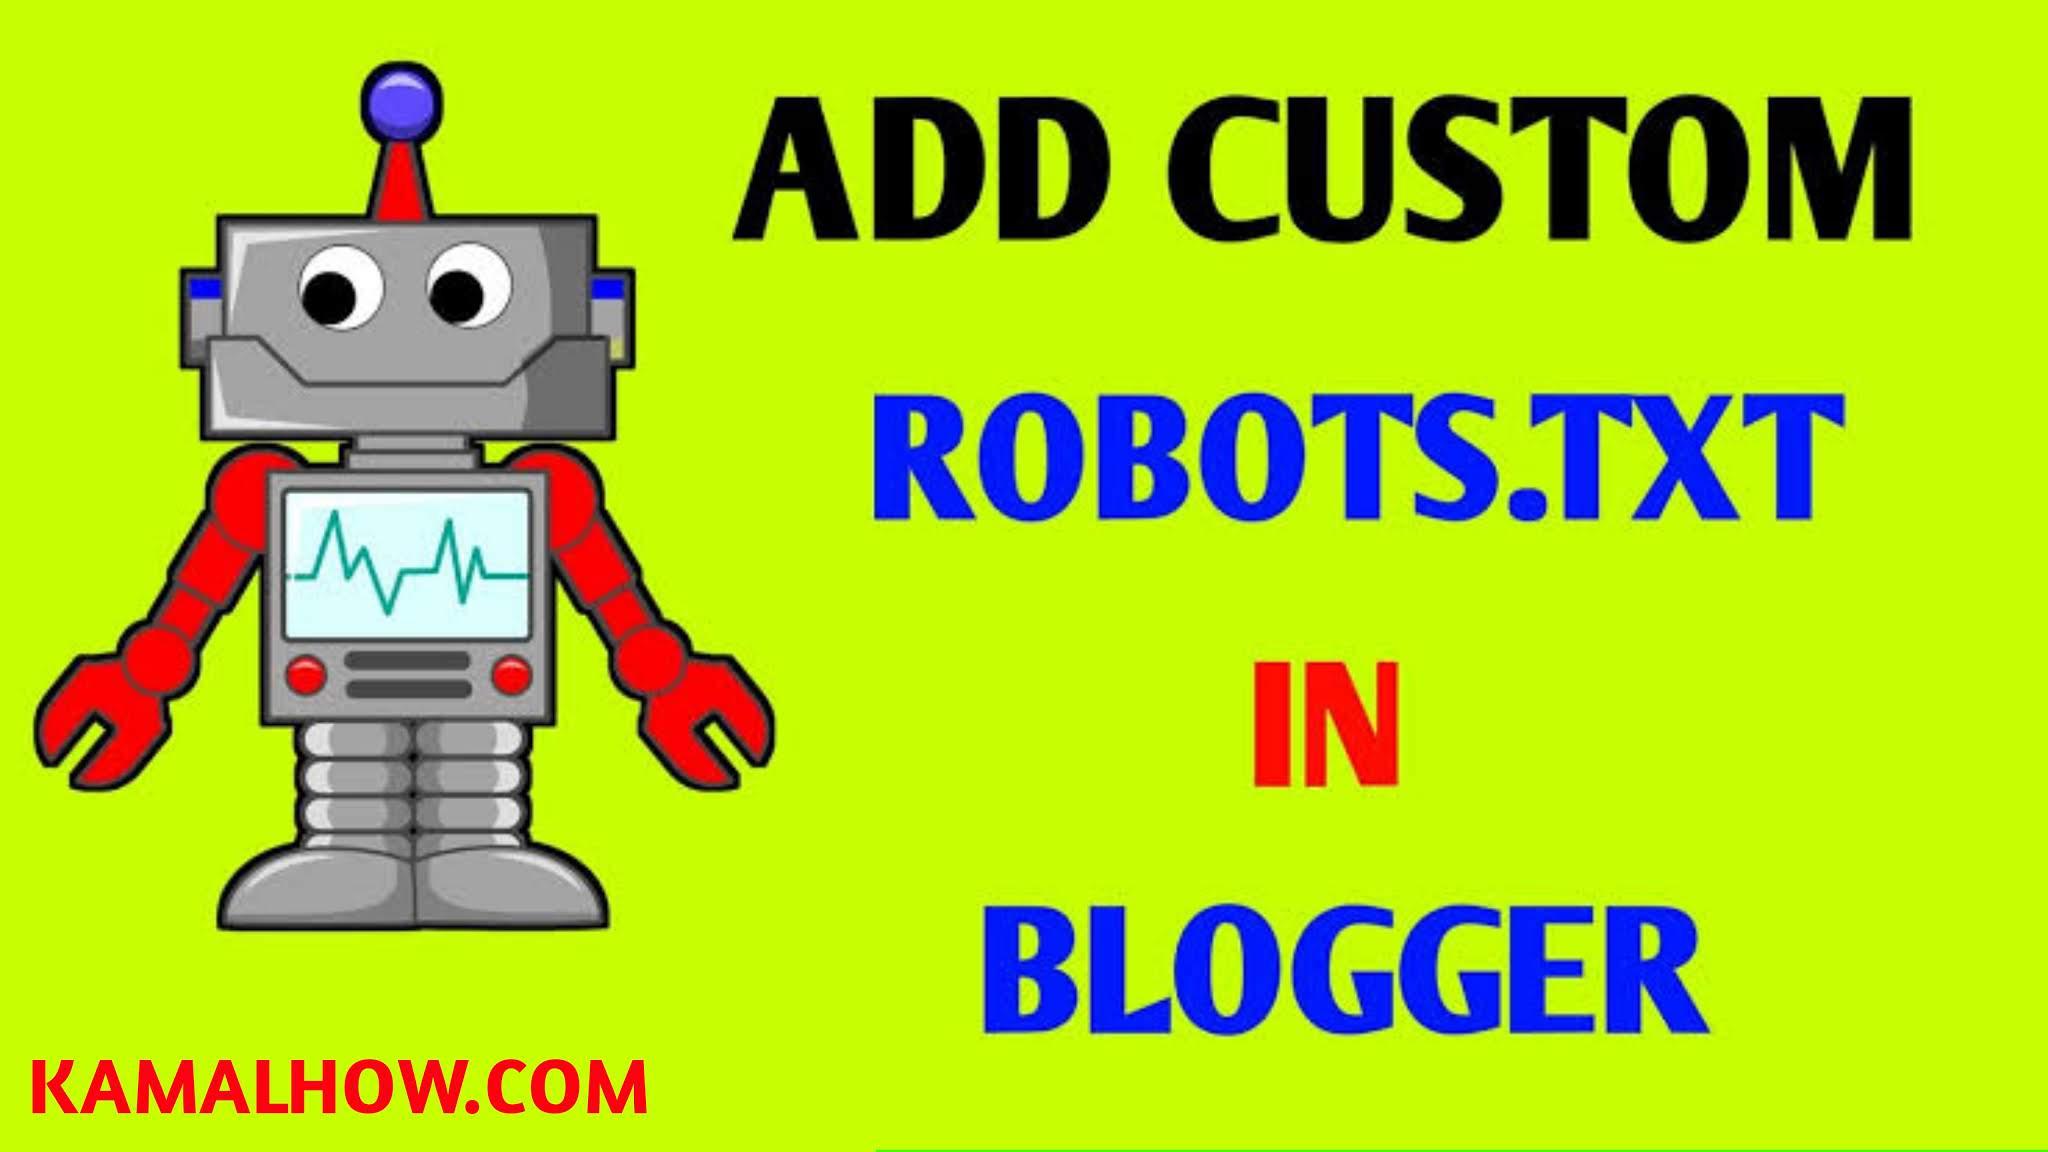 kamal how, kamalhow.com, technology, custom robots.txt file on blogger hindi, blogger tutorial, step by step hindi, blogger tutorial hindi, hindi technology video,